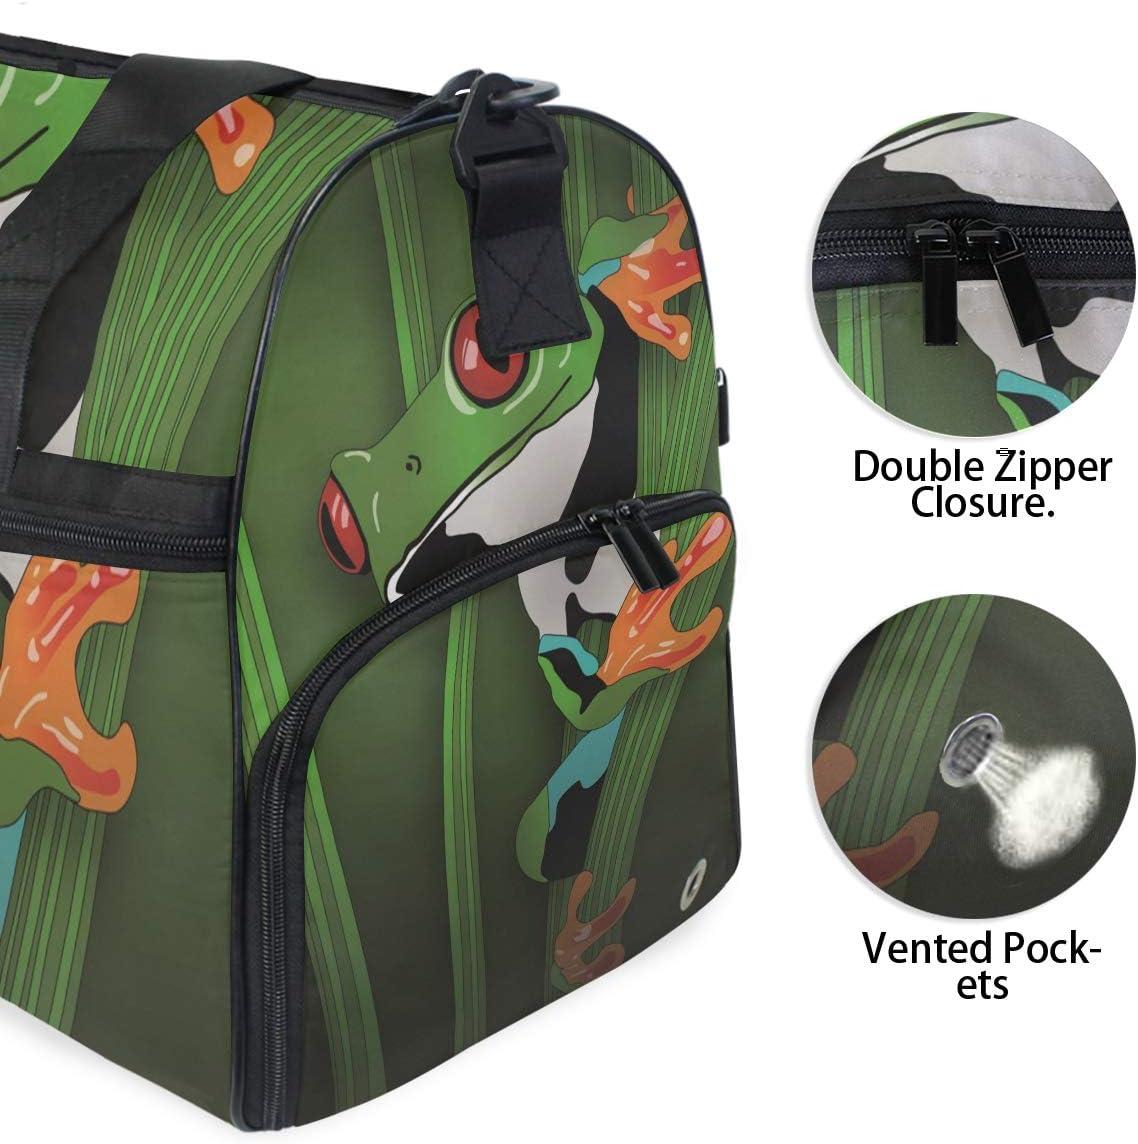 FAJRO Duffle Bag for Women Men Hiding Fog Travel Duffel Bag Large Size Water-proof Tear Resistant